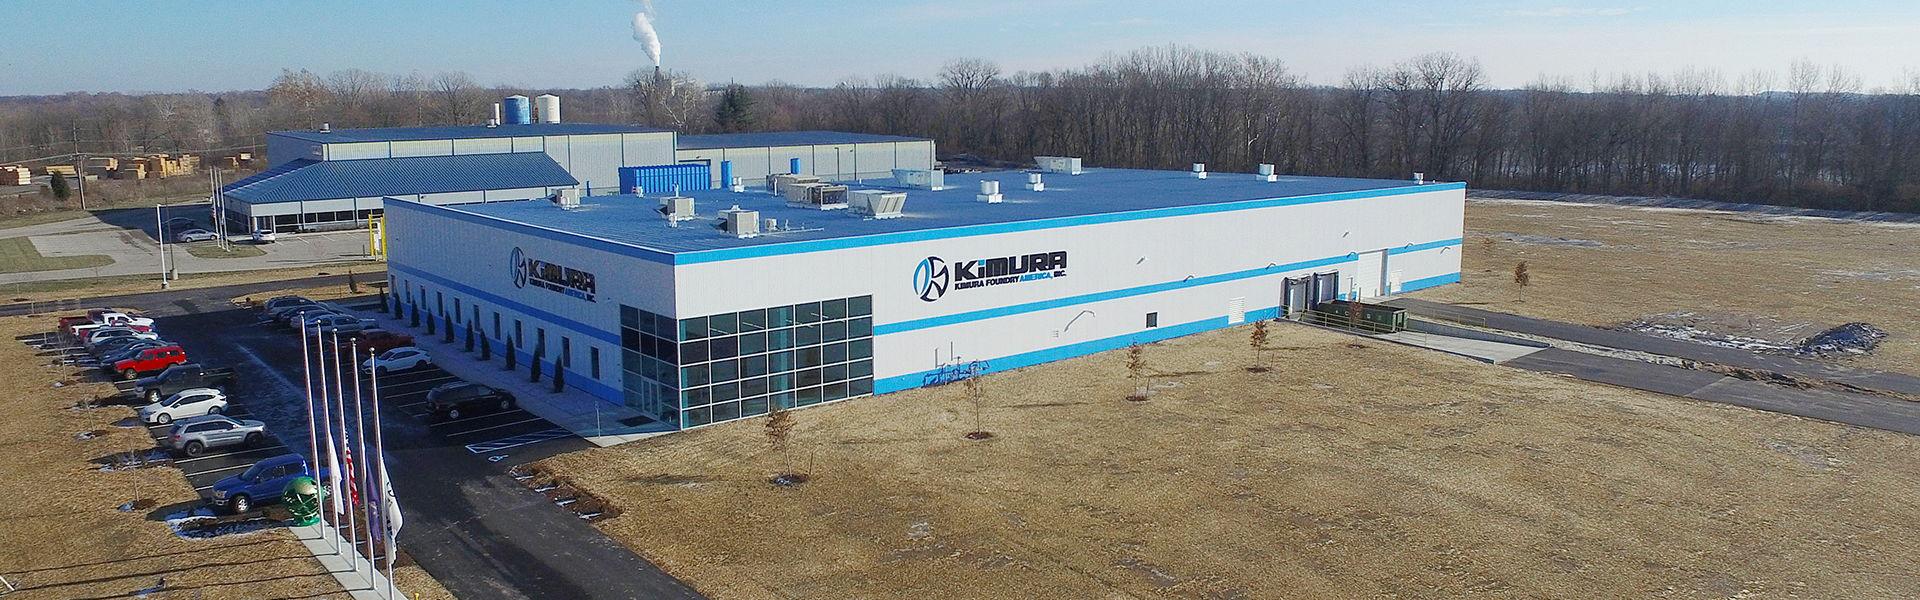 Image for Kimura Foundry America